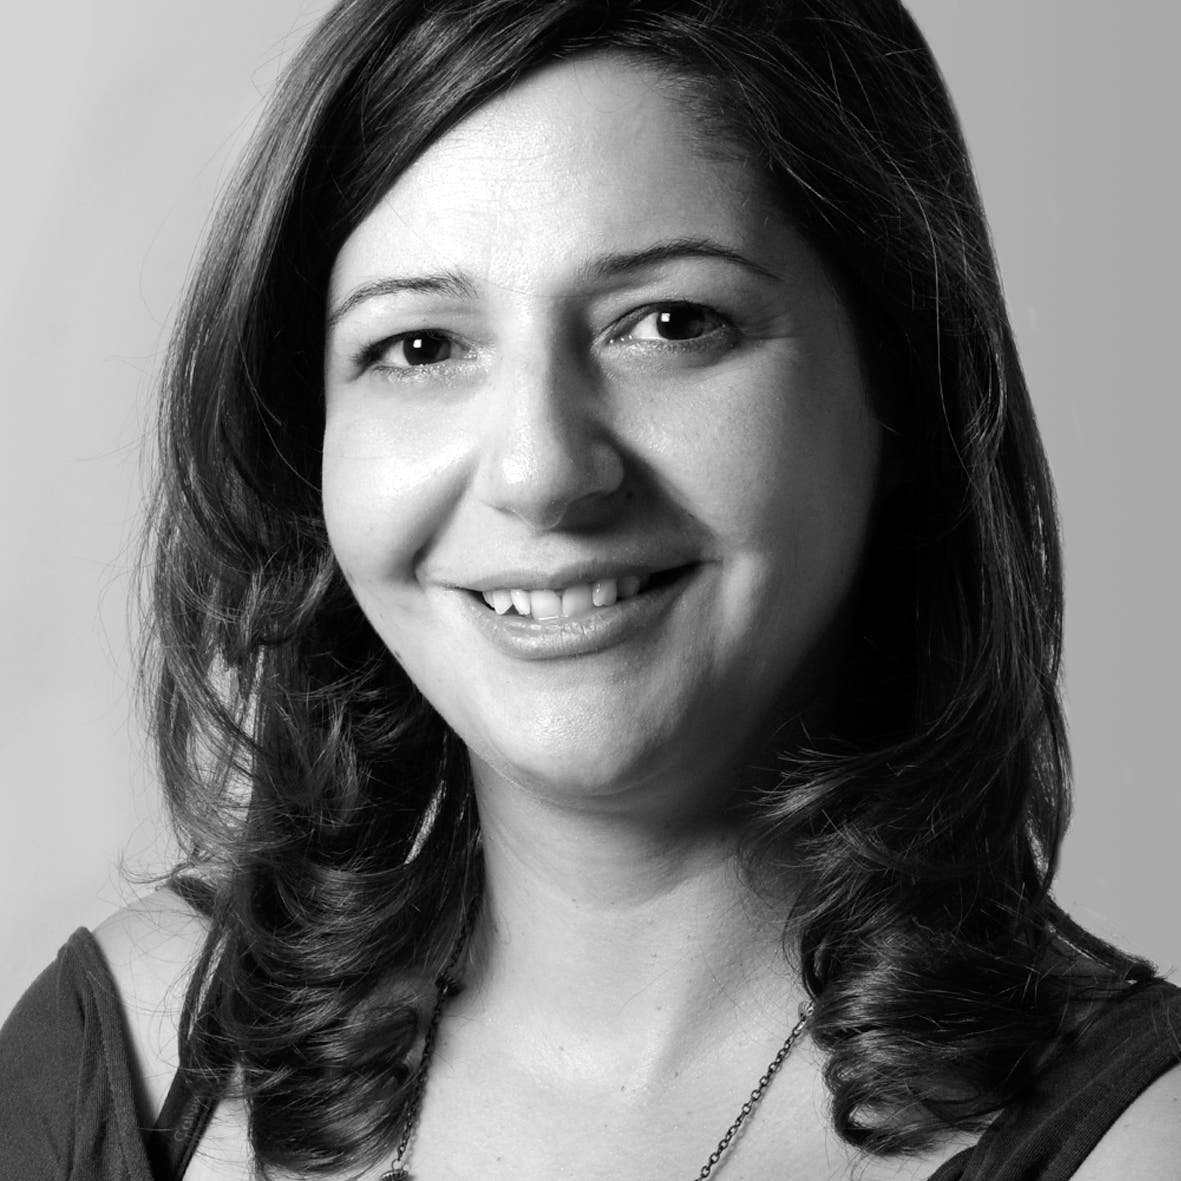 Hanin Ghaddar, Managing Editor for NOW's English service